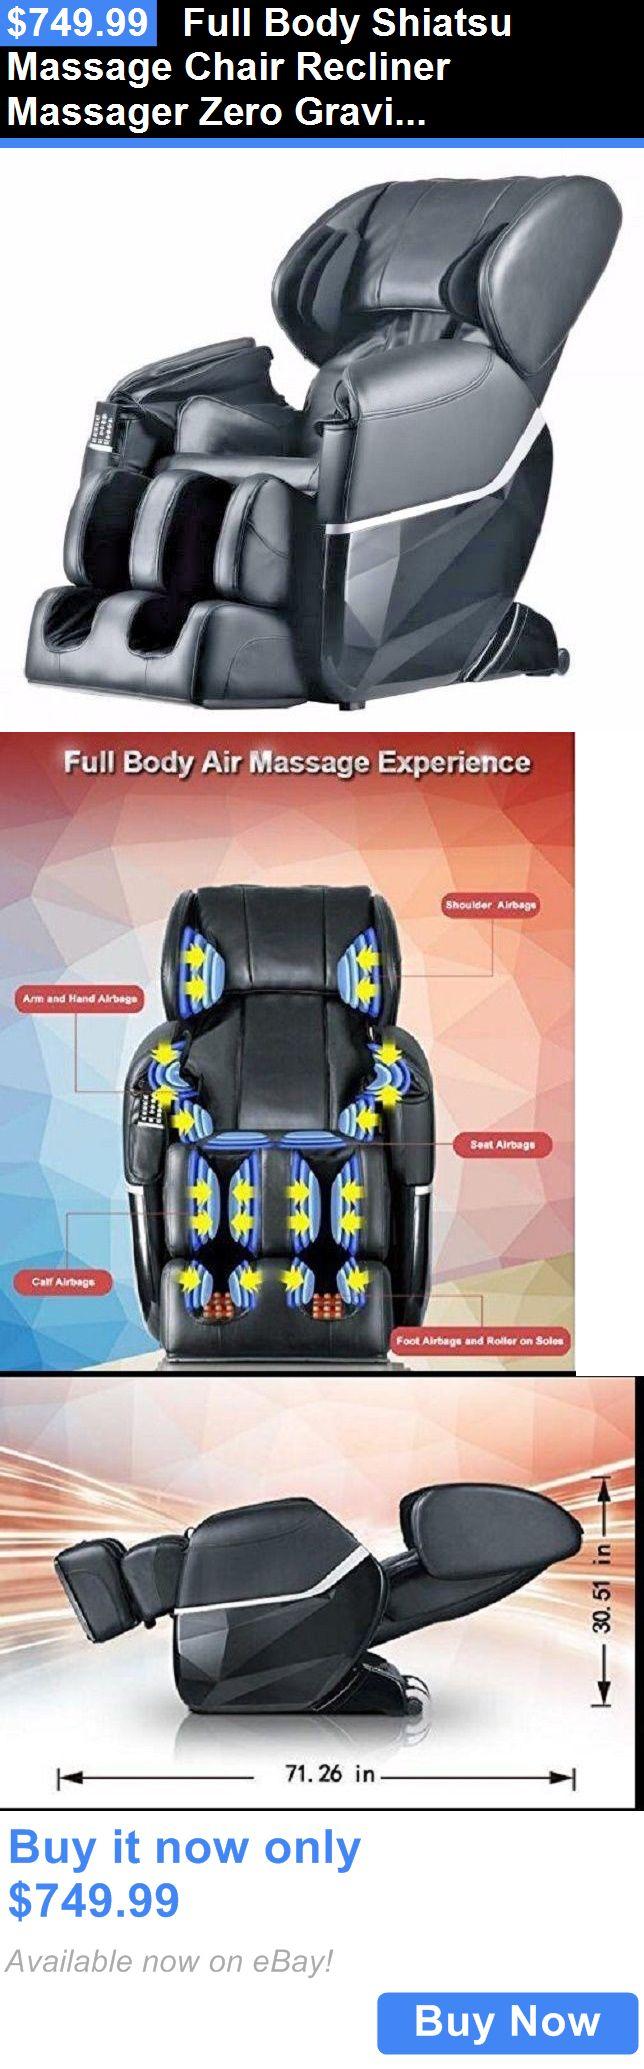 Massagers: Full Body Shiatsu Massage Chair Recliner Massager Zero Gravity Heat Foot Roller BUY IT NOW ONLY: $749.99